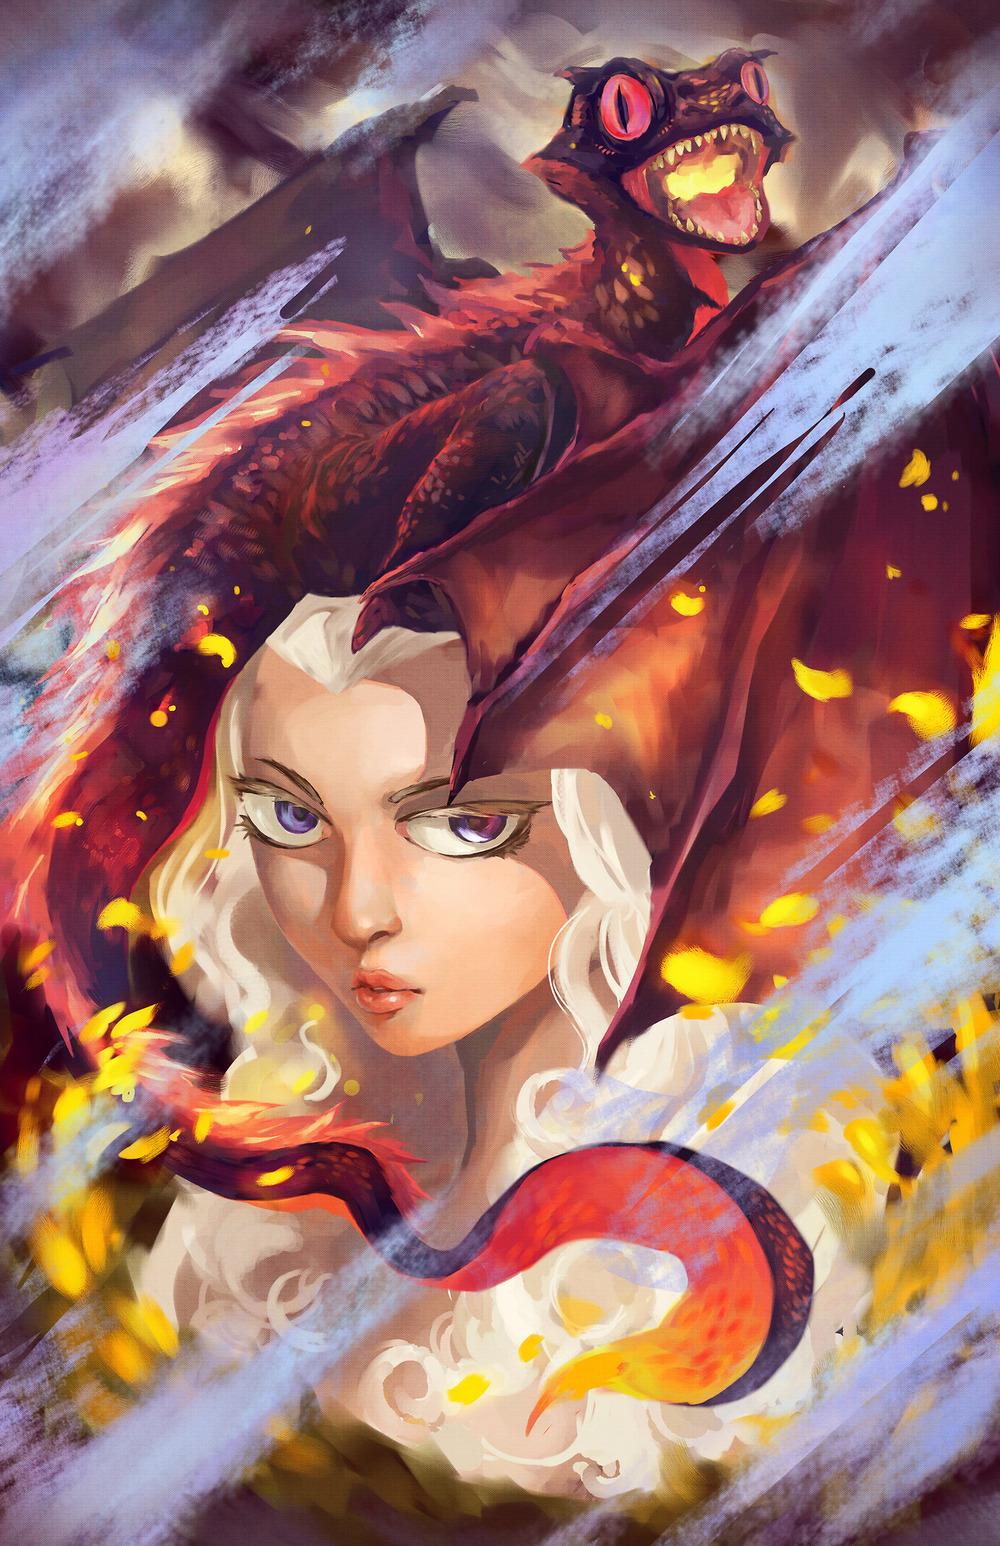 Doodle-Mon-Game-of-Thrones-Daenerys.jpg